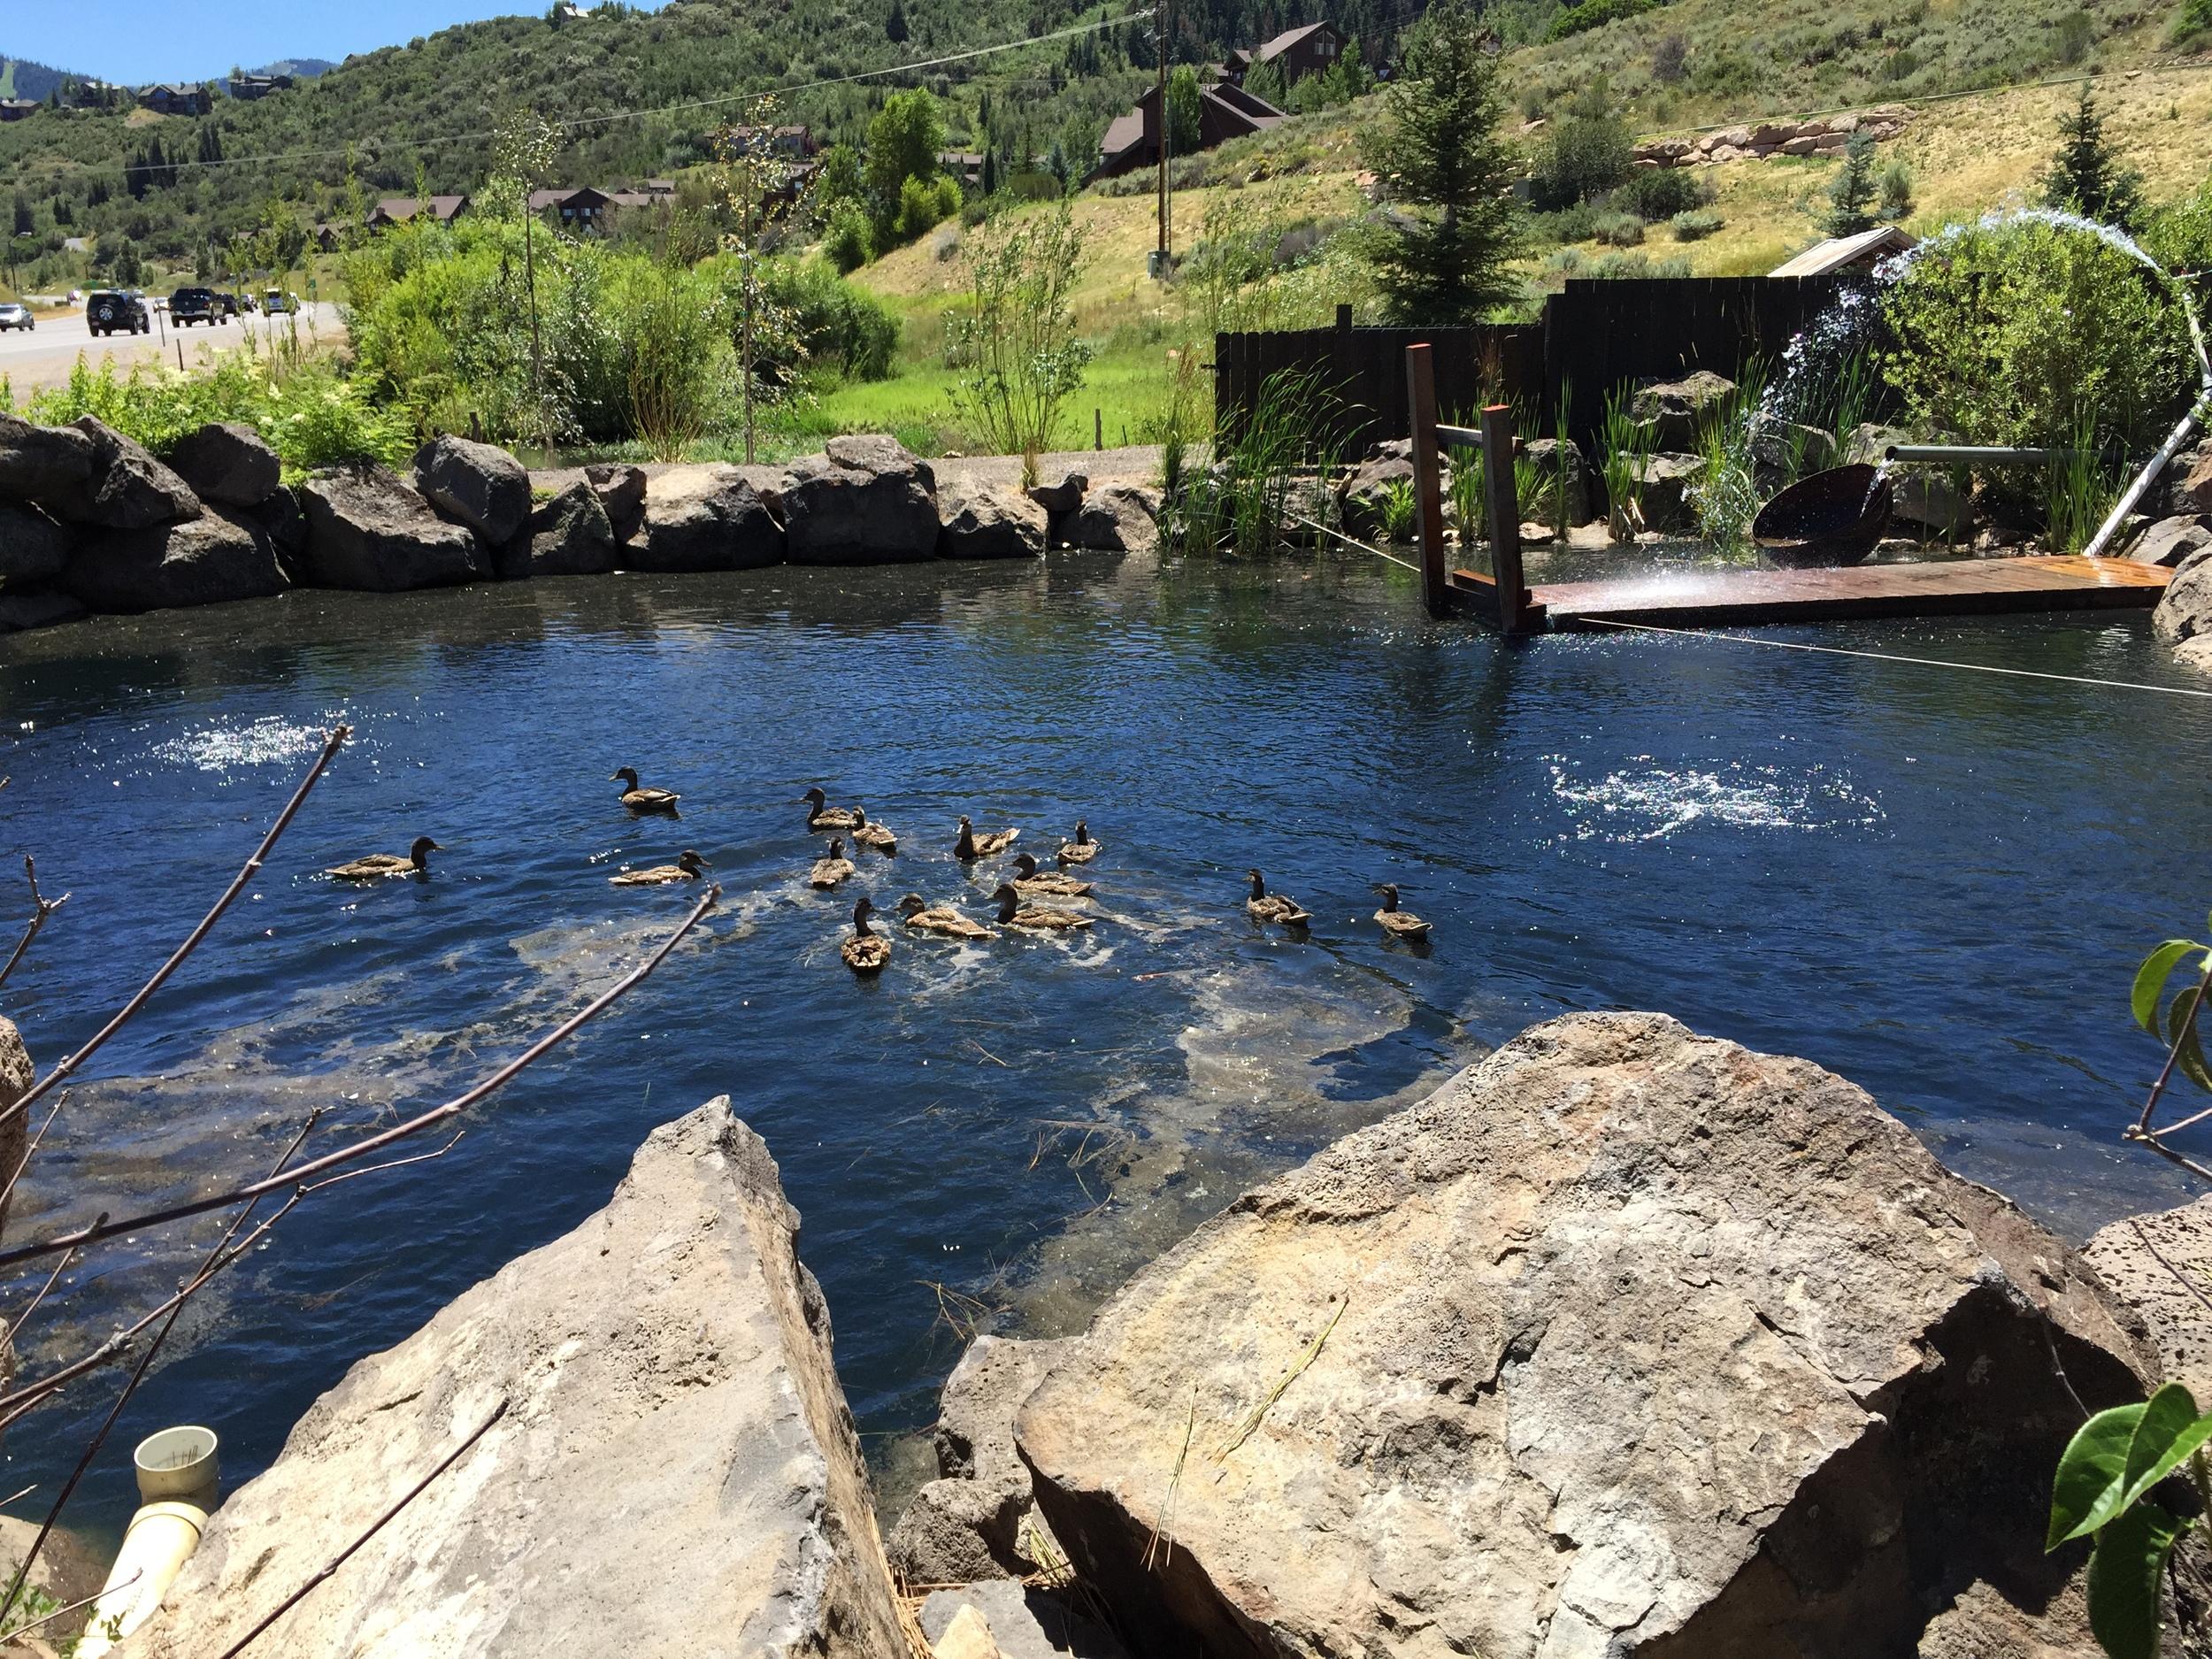 Ducks loving their pond